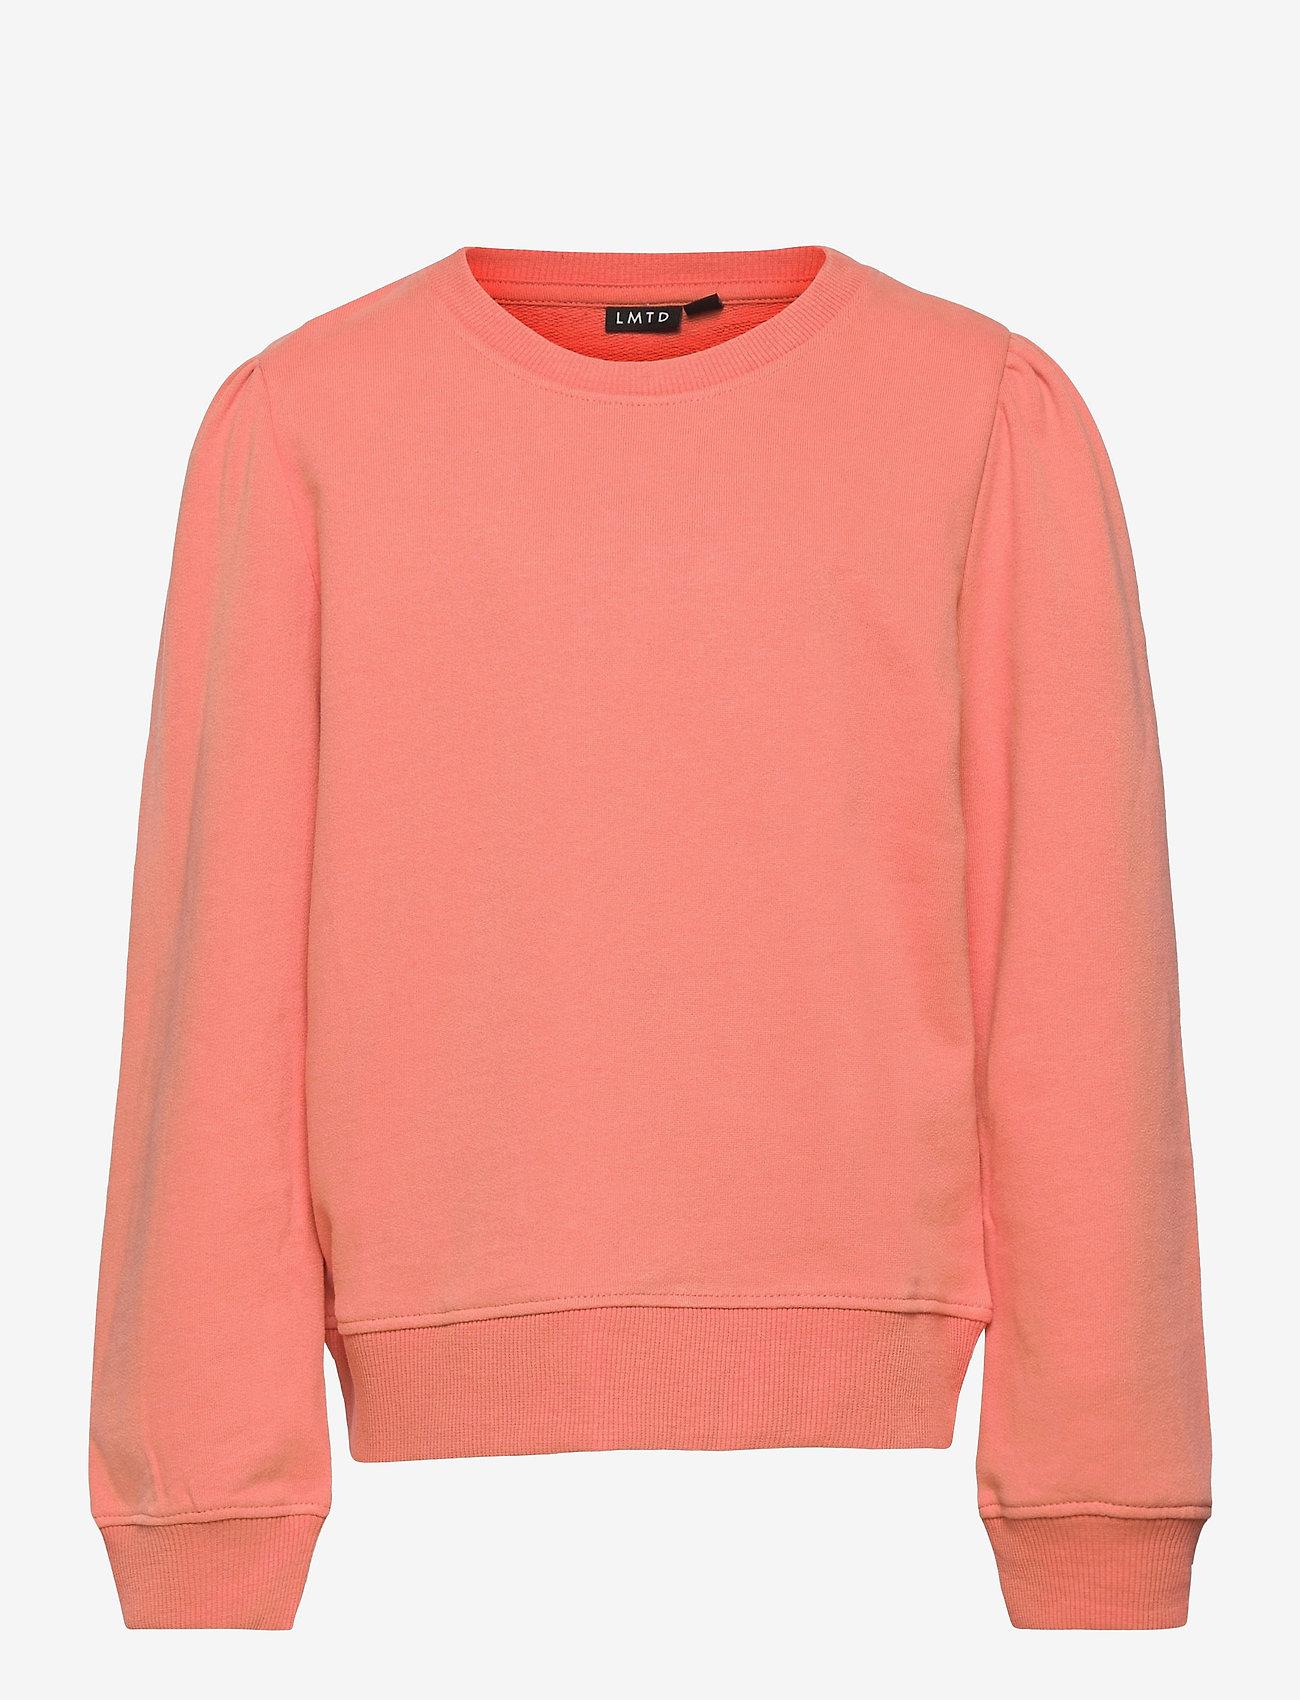 LMTD - NLFFATIAN LS SHORT SWEAT - sweatshirts - crabapple - 0